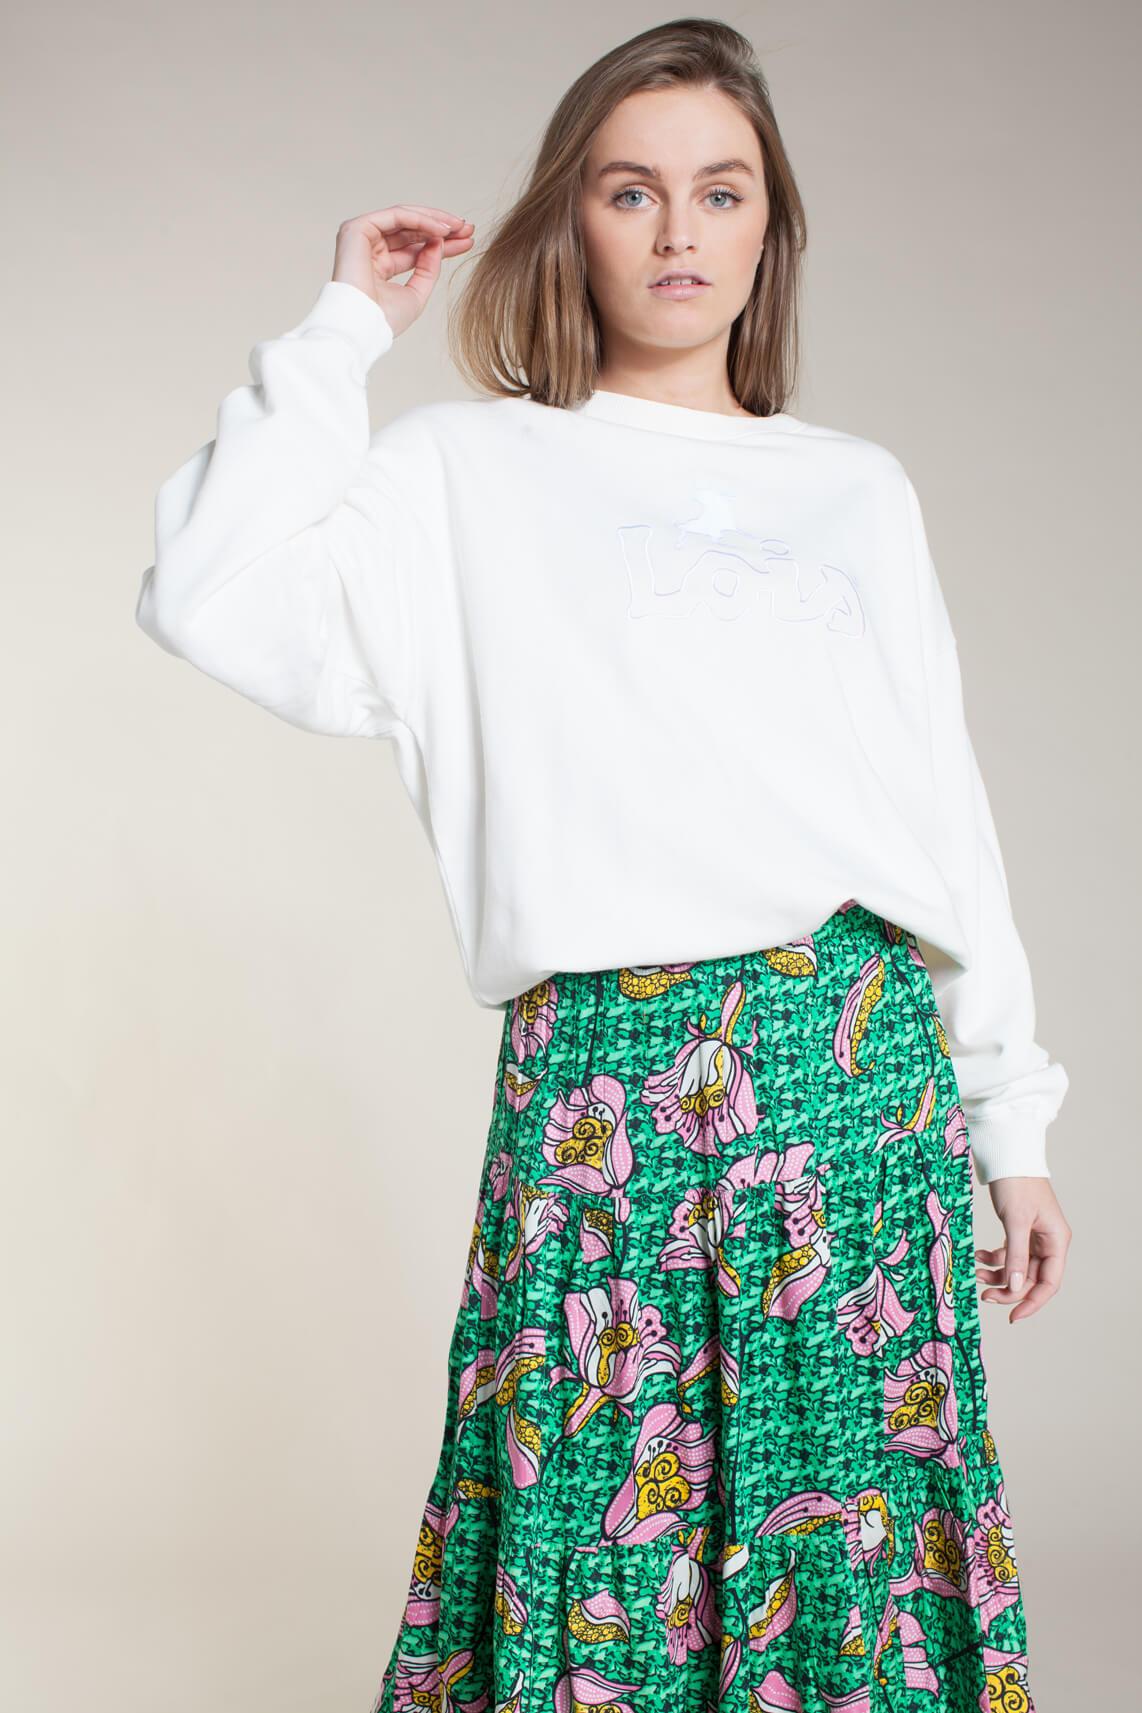 Lois Dames Sanna oversized sweater wit